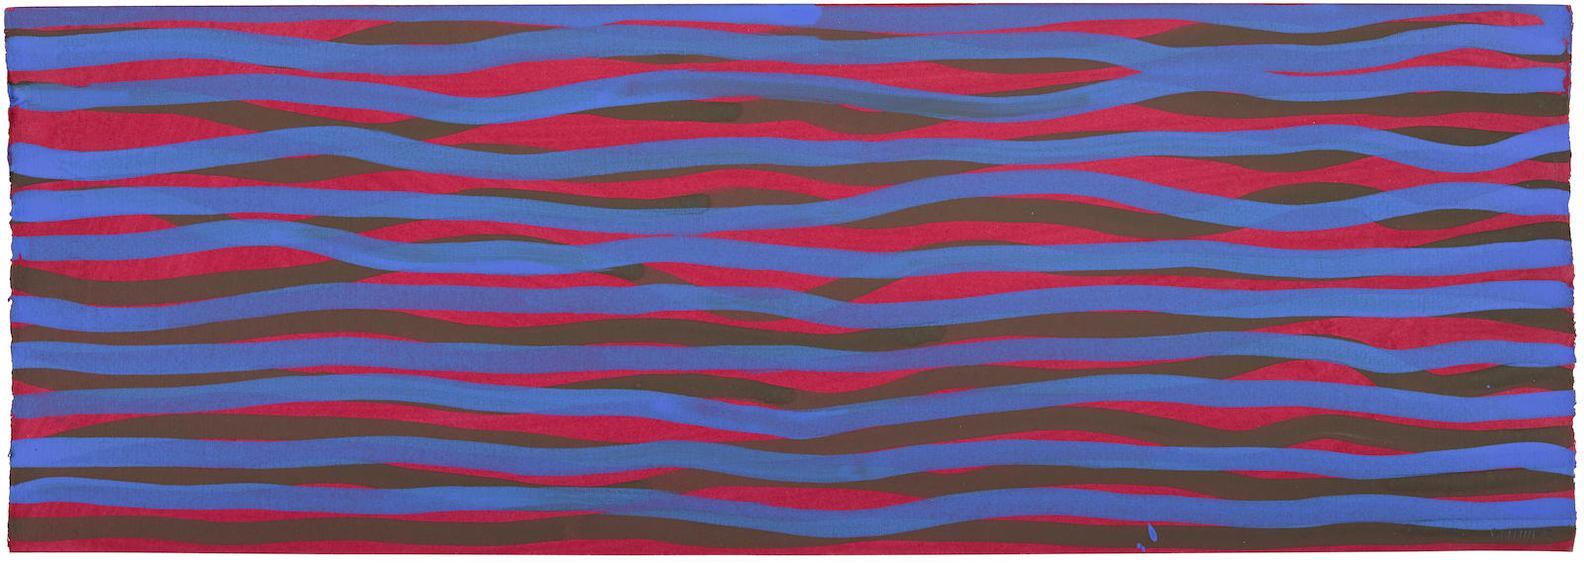 Sol LeWitt-Horizontal Brushstrokes (More Or Less)-2003